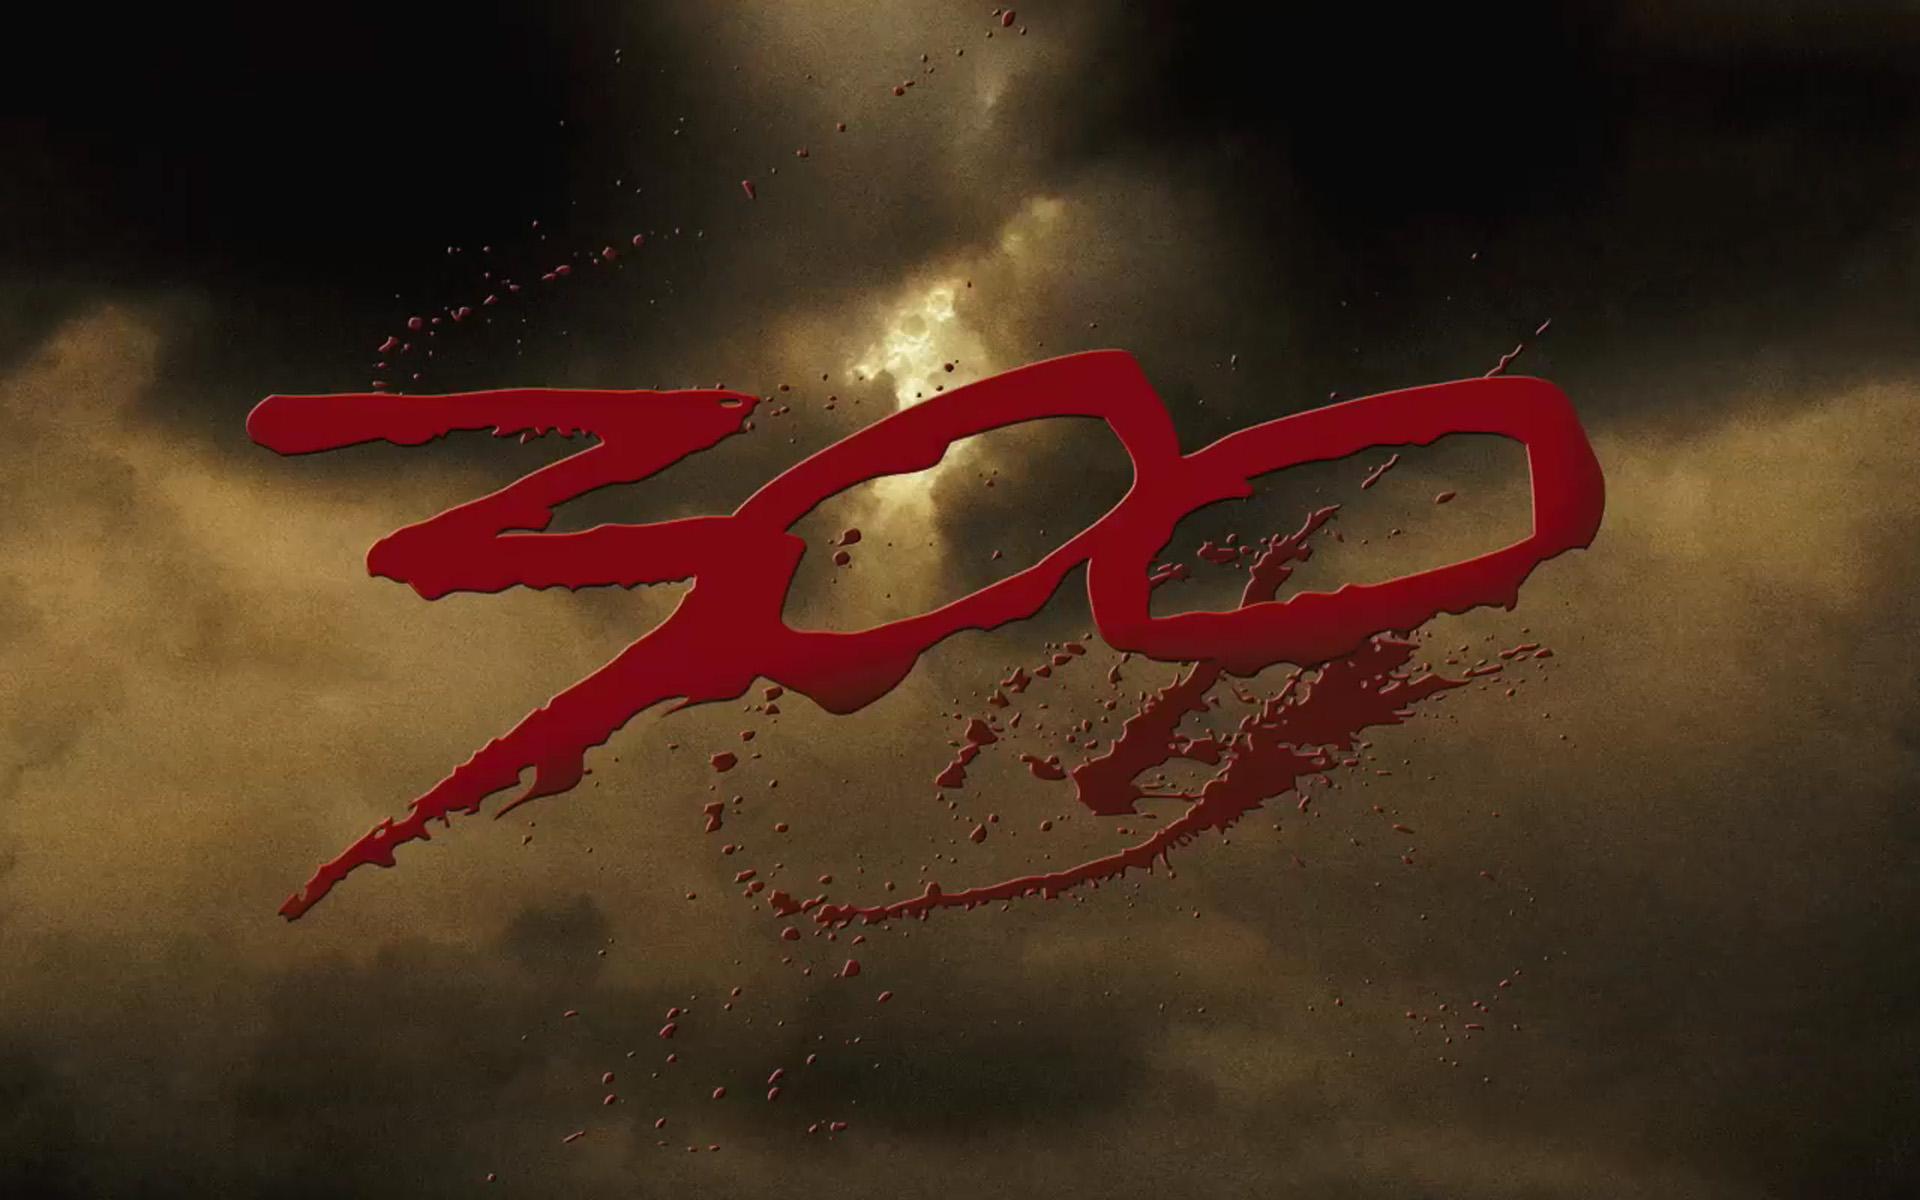 300burpees